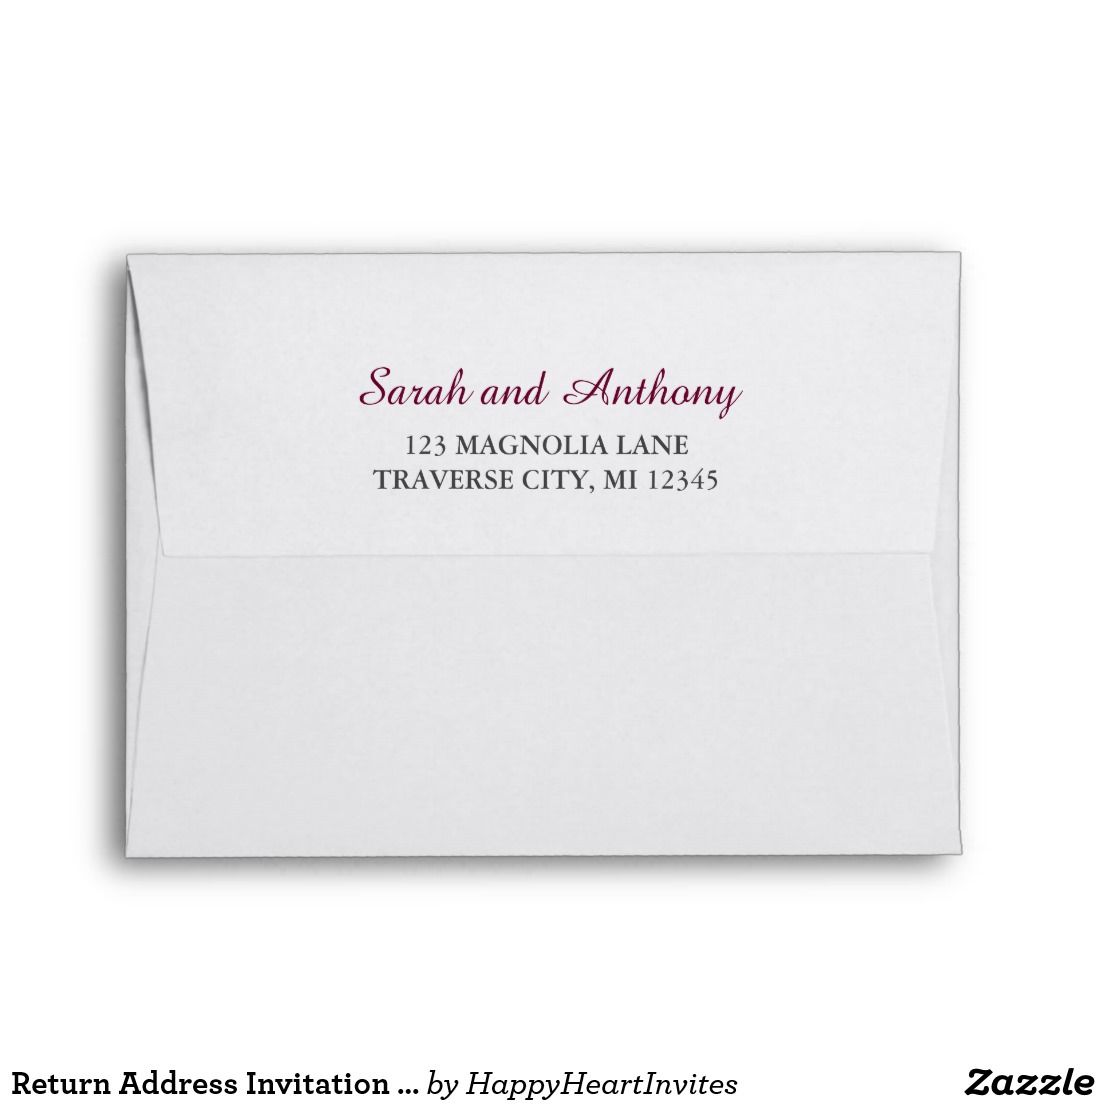 Return Address Invitation Mailing Envelope Zazzle Com Wedding Invitation Envelopes Fun Wedding Invitations Invitations